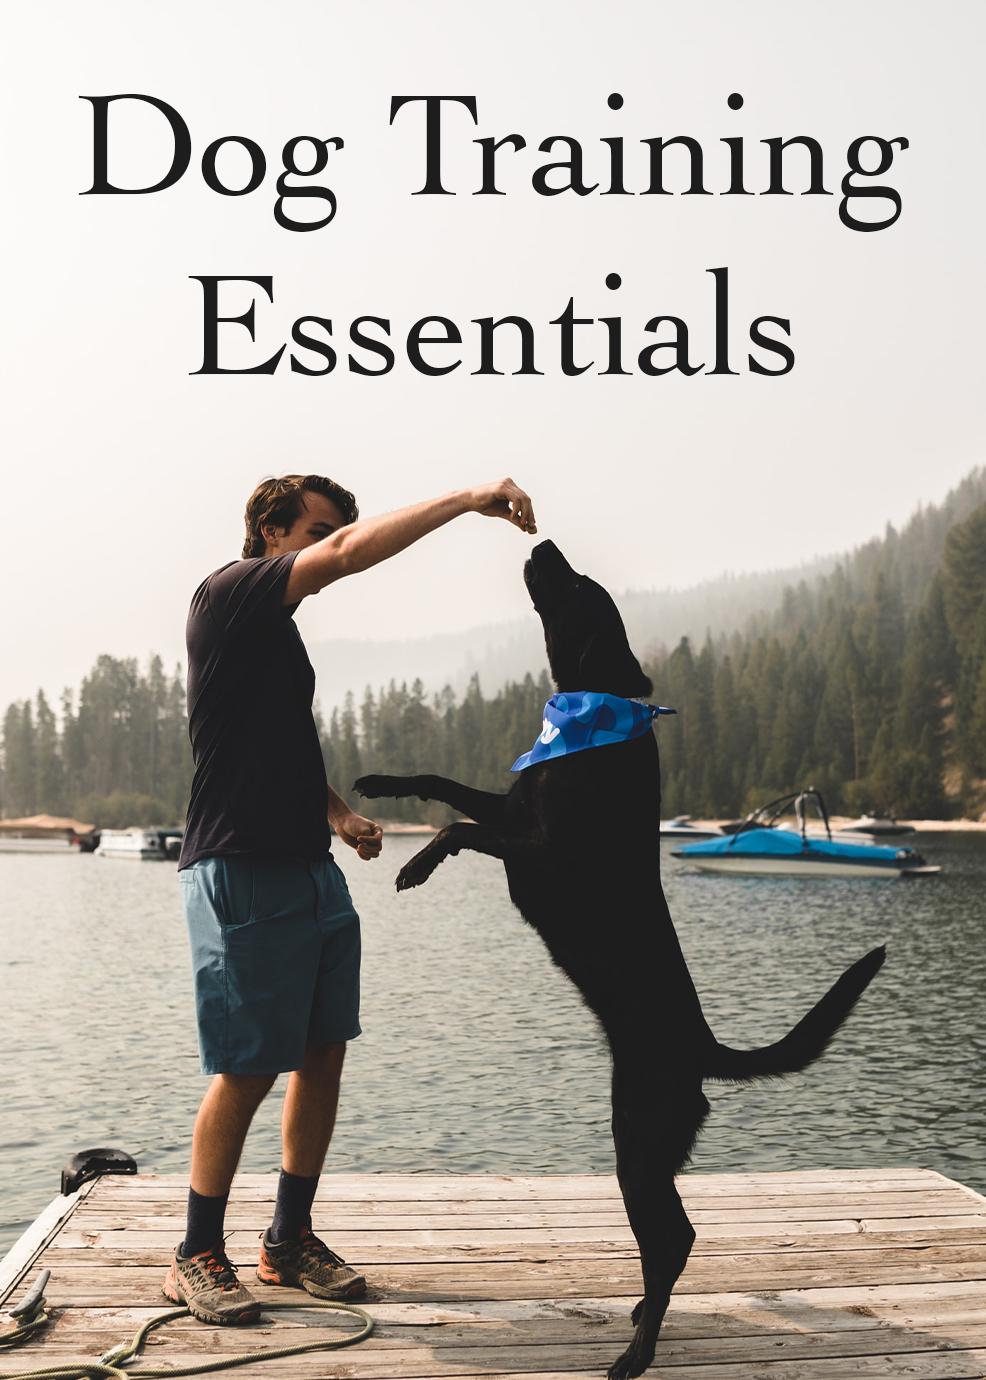 Dog Training Essentials